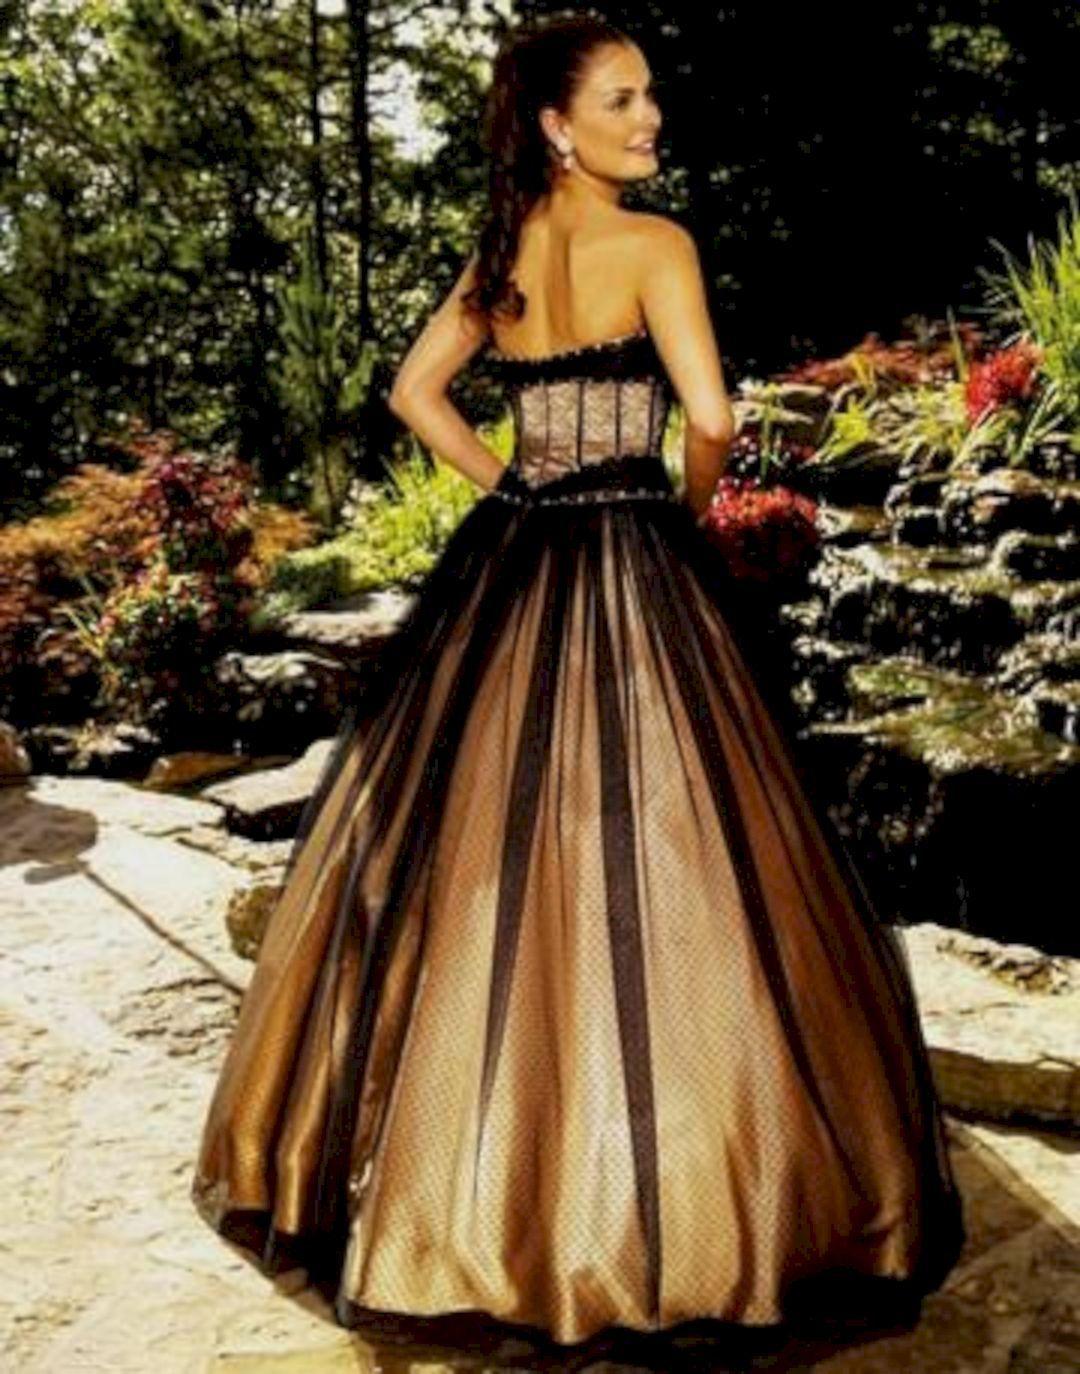 Best 15 Black Gold Wedding Gown For Bride Looks More Elegant Gold Wedding Dress Gold Wedding Gowns Black Wedding Dresses [ 1374 x 1080 Pixel ]